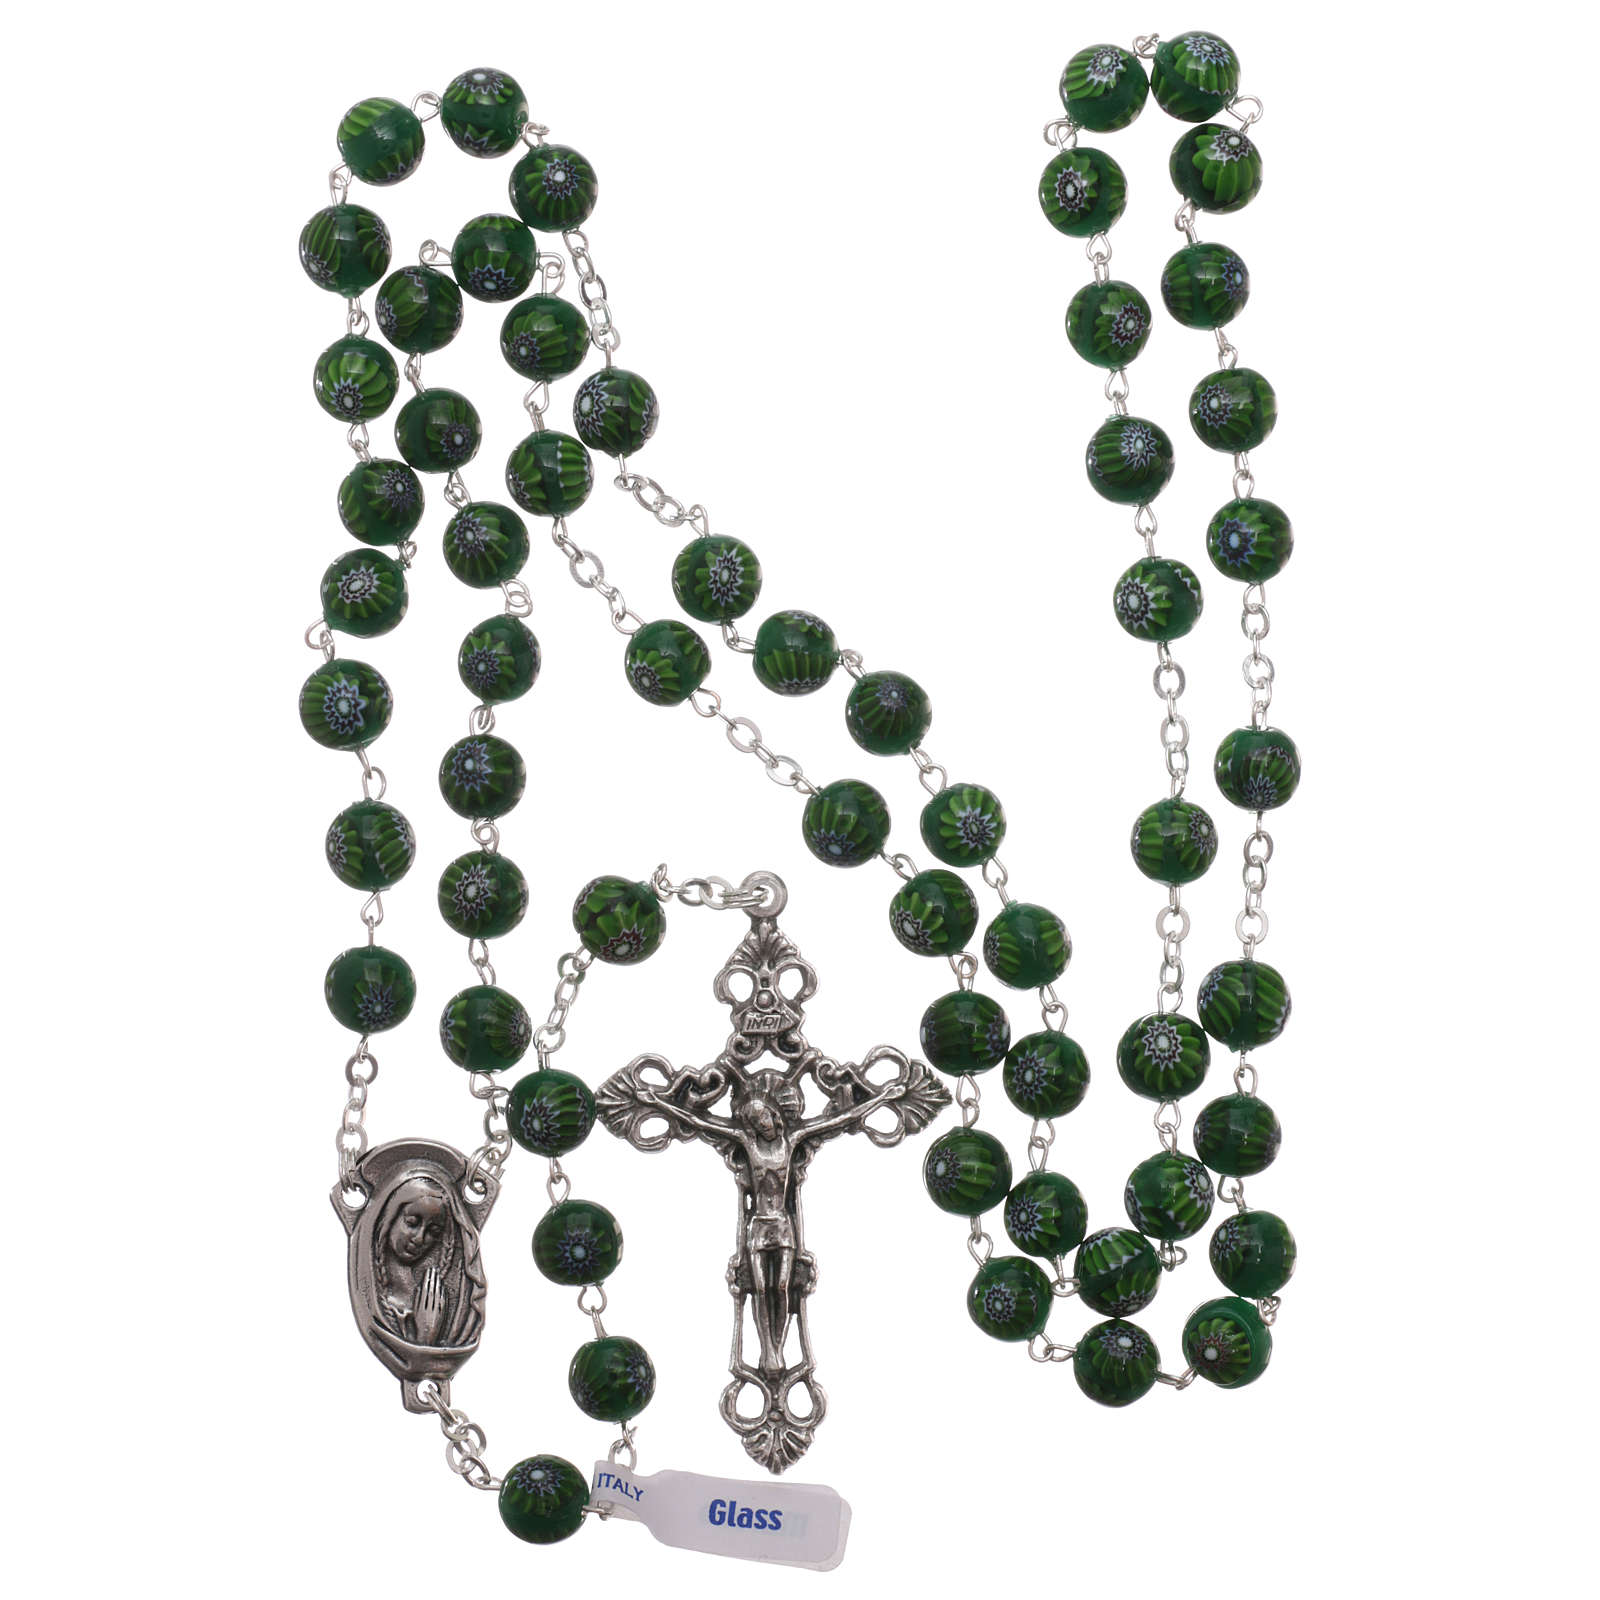 Chapelet en verre de Murano vert avec motifs floraux 8 mm 4